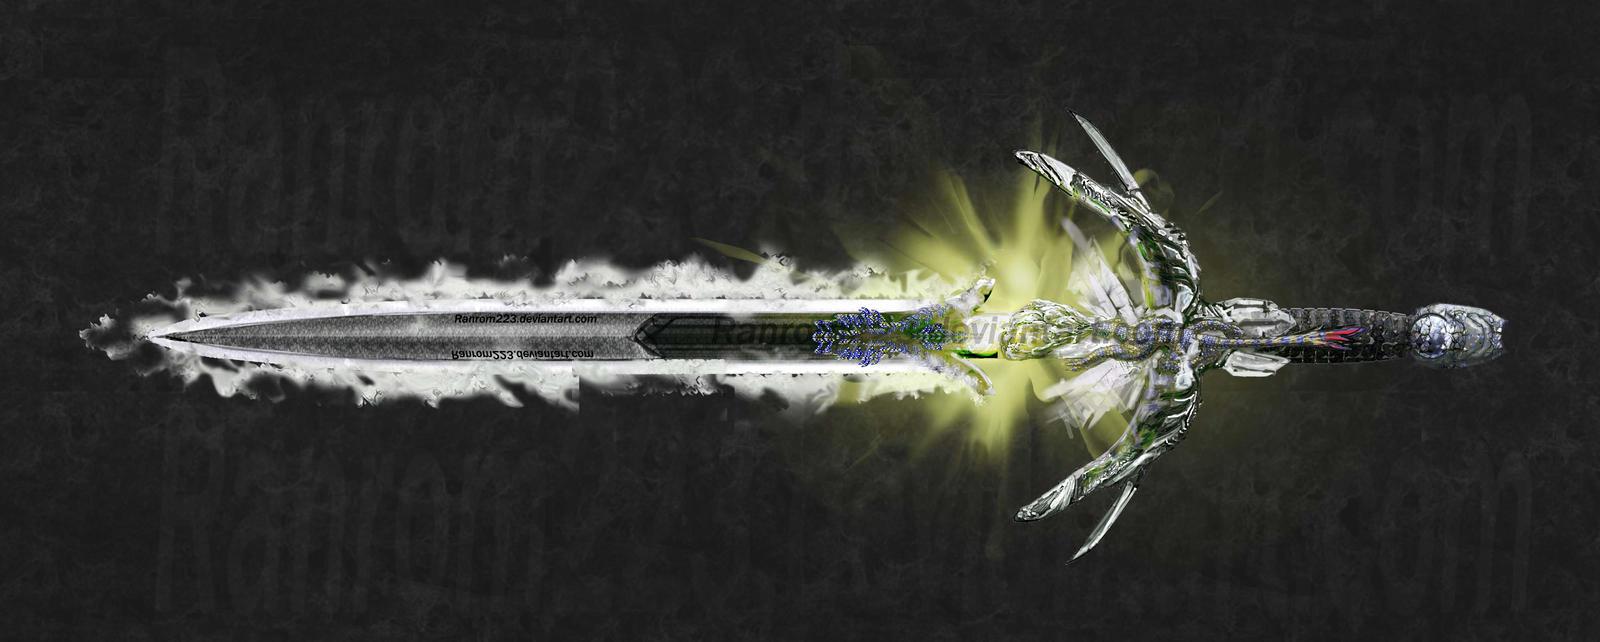 Weaponry 258 by Random223